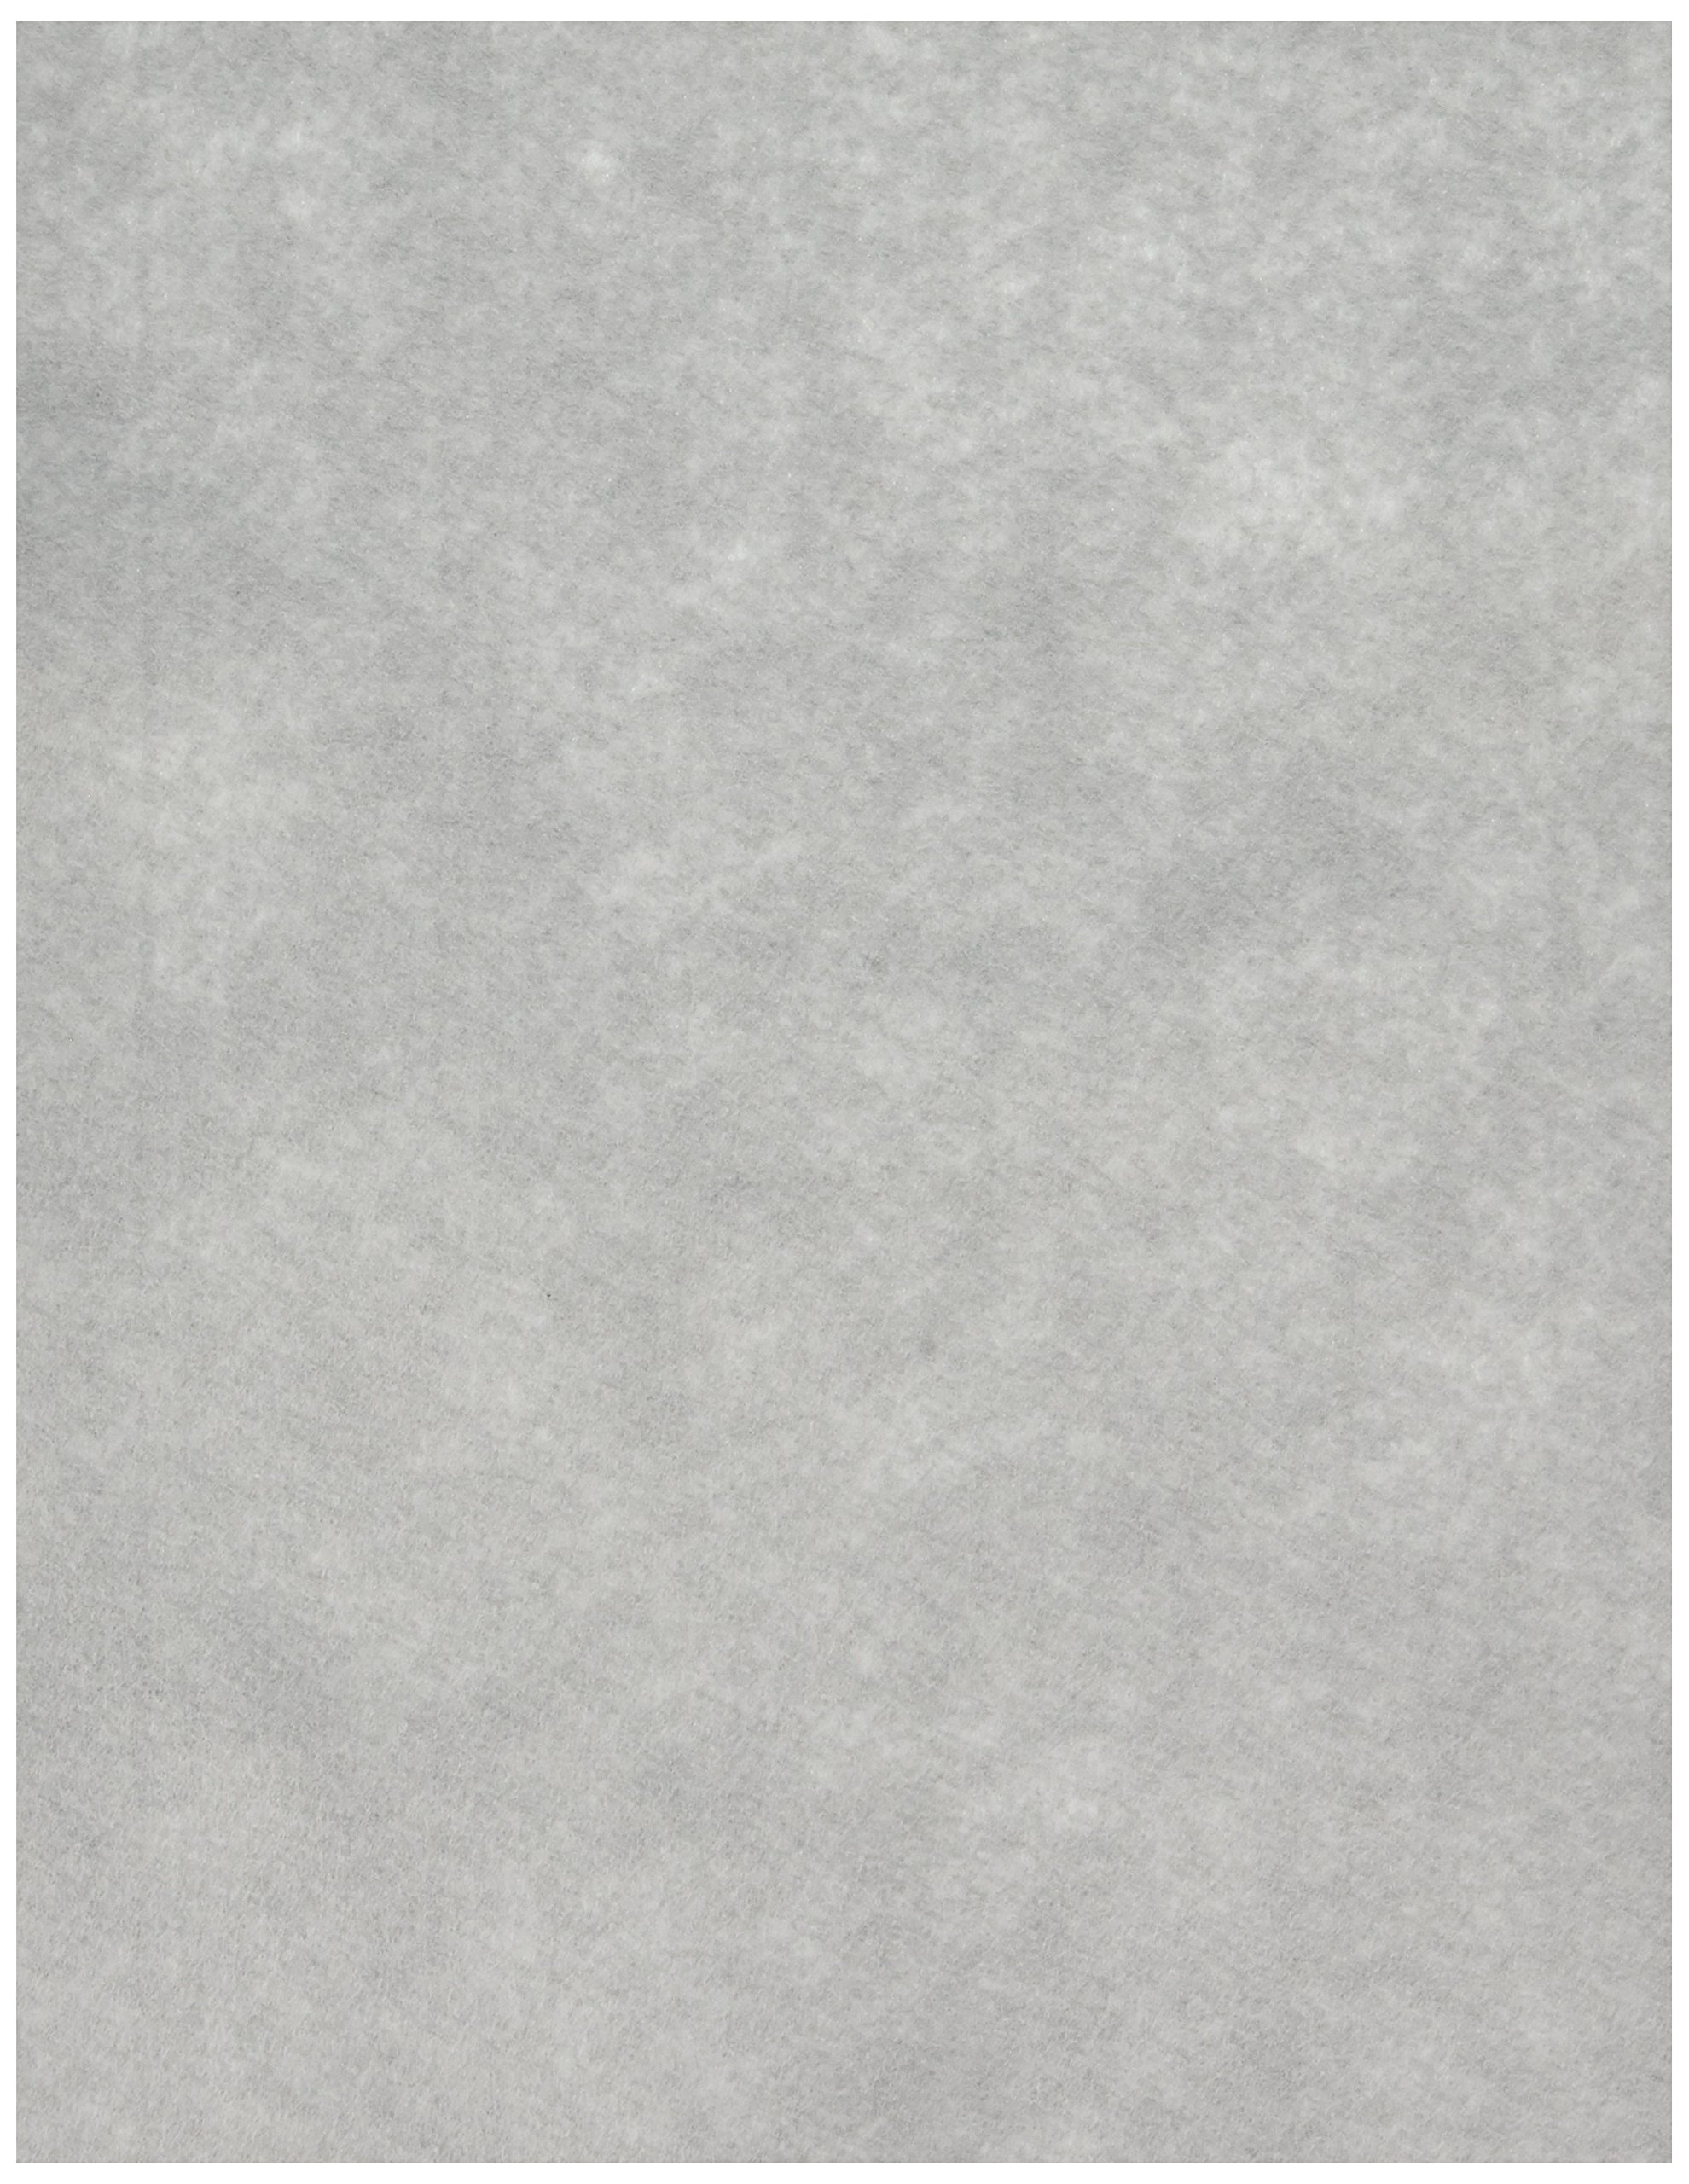 Rainbow Classic Felt 9''X12''-Silver Gray  24 per pack